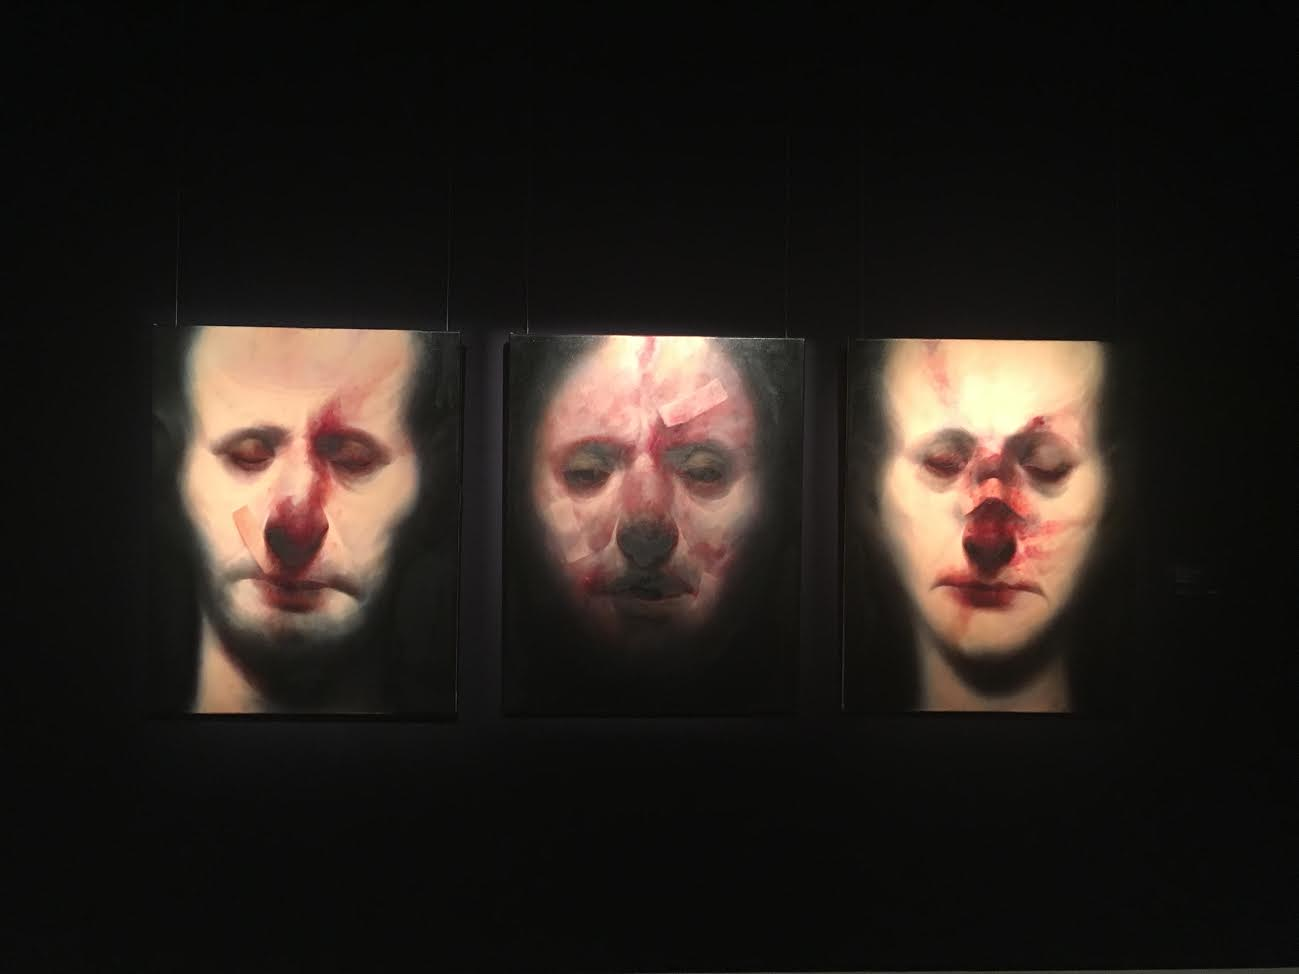 Arte Bowie